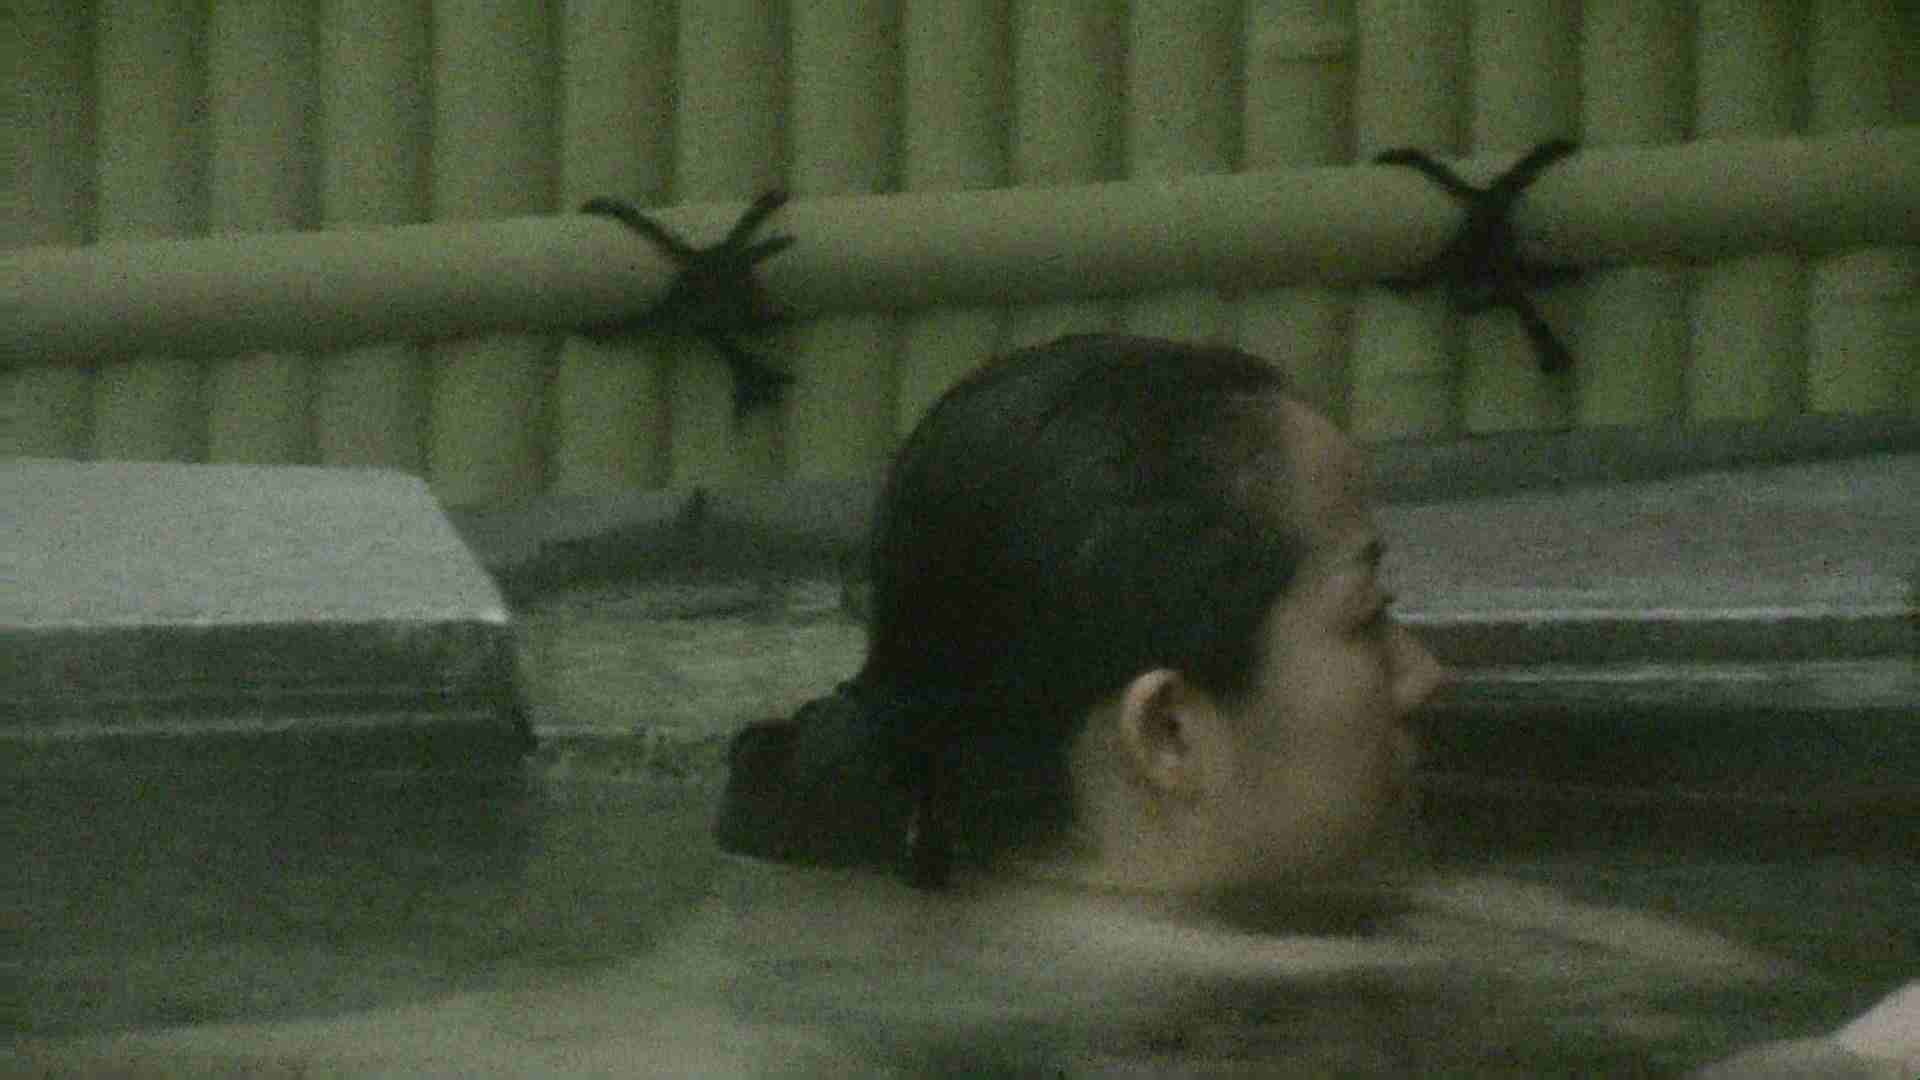 Aquaな露天風呂Vol.539 盗撮 エロ画像 50枚 44